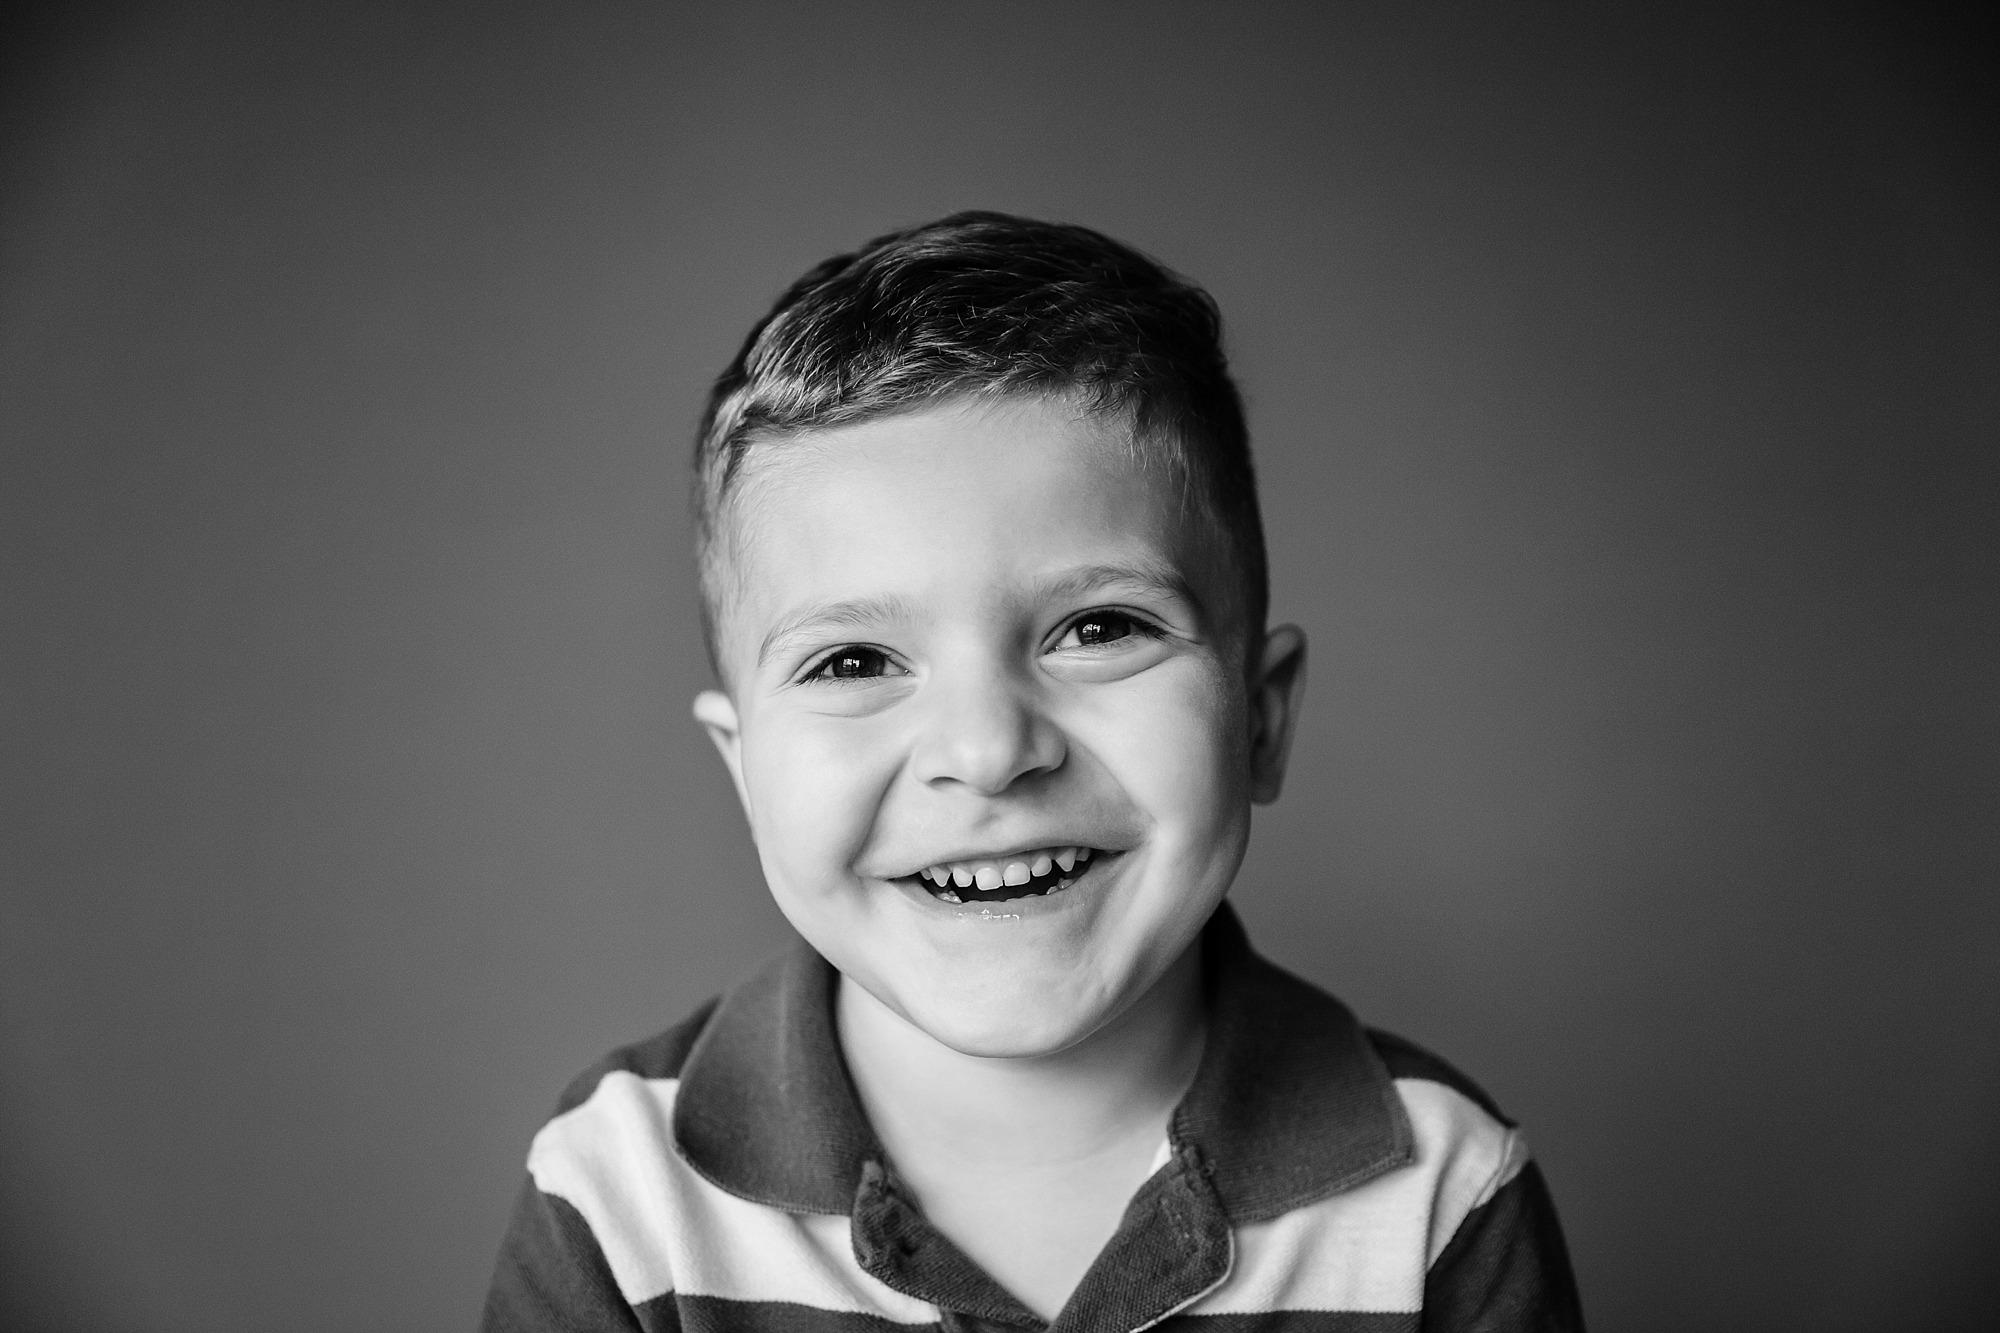 Modern_Childrens_Portraits_Hunnicutt_Photography_Collages_0009